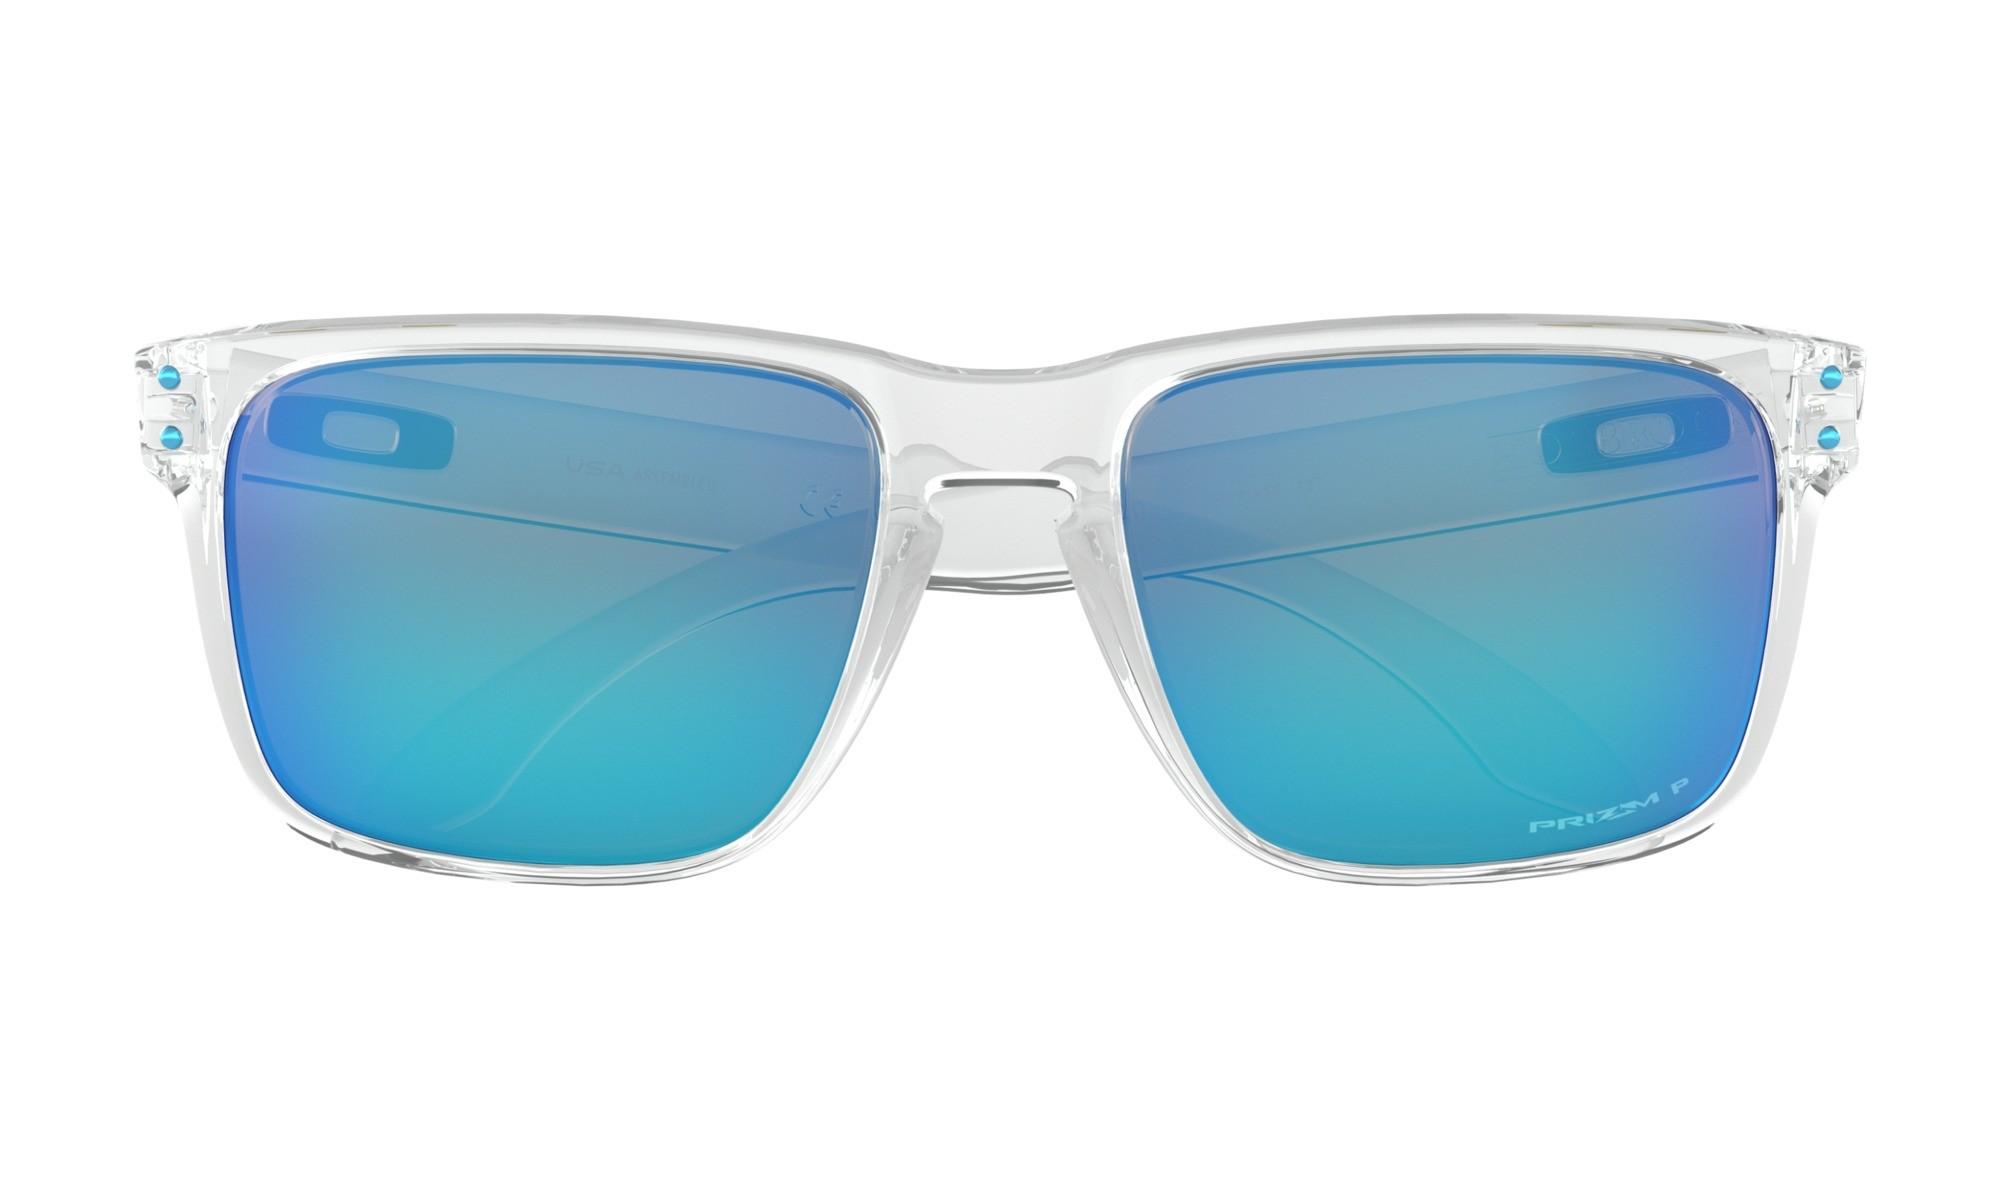 e02cd240141f9 Oakley Holbrook XL Polished Clear Prizm Sapphire Polarized Sunglasses